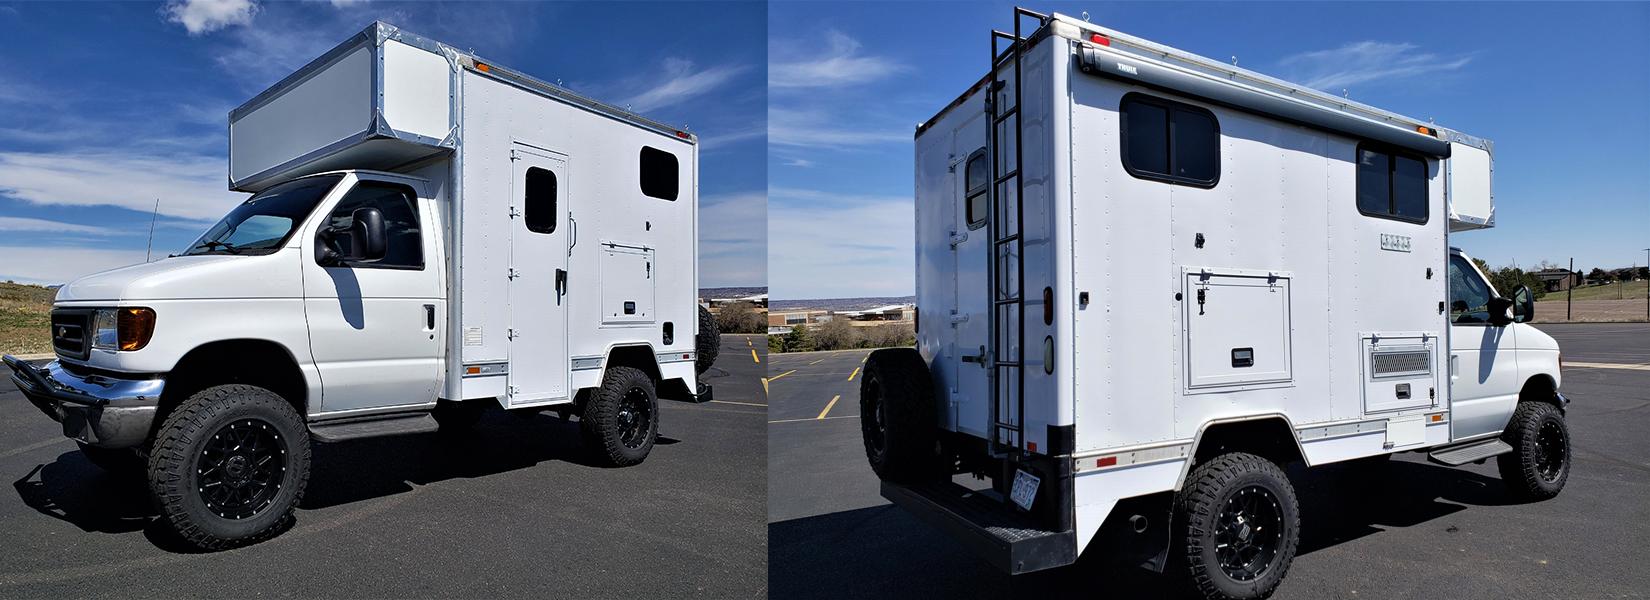 2003 E-350 Cutaway Box Van 4x4